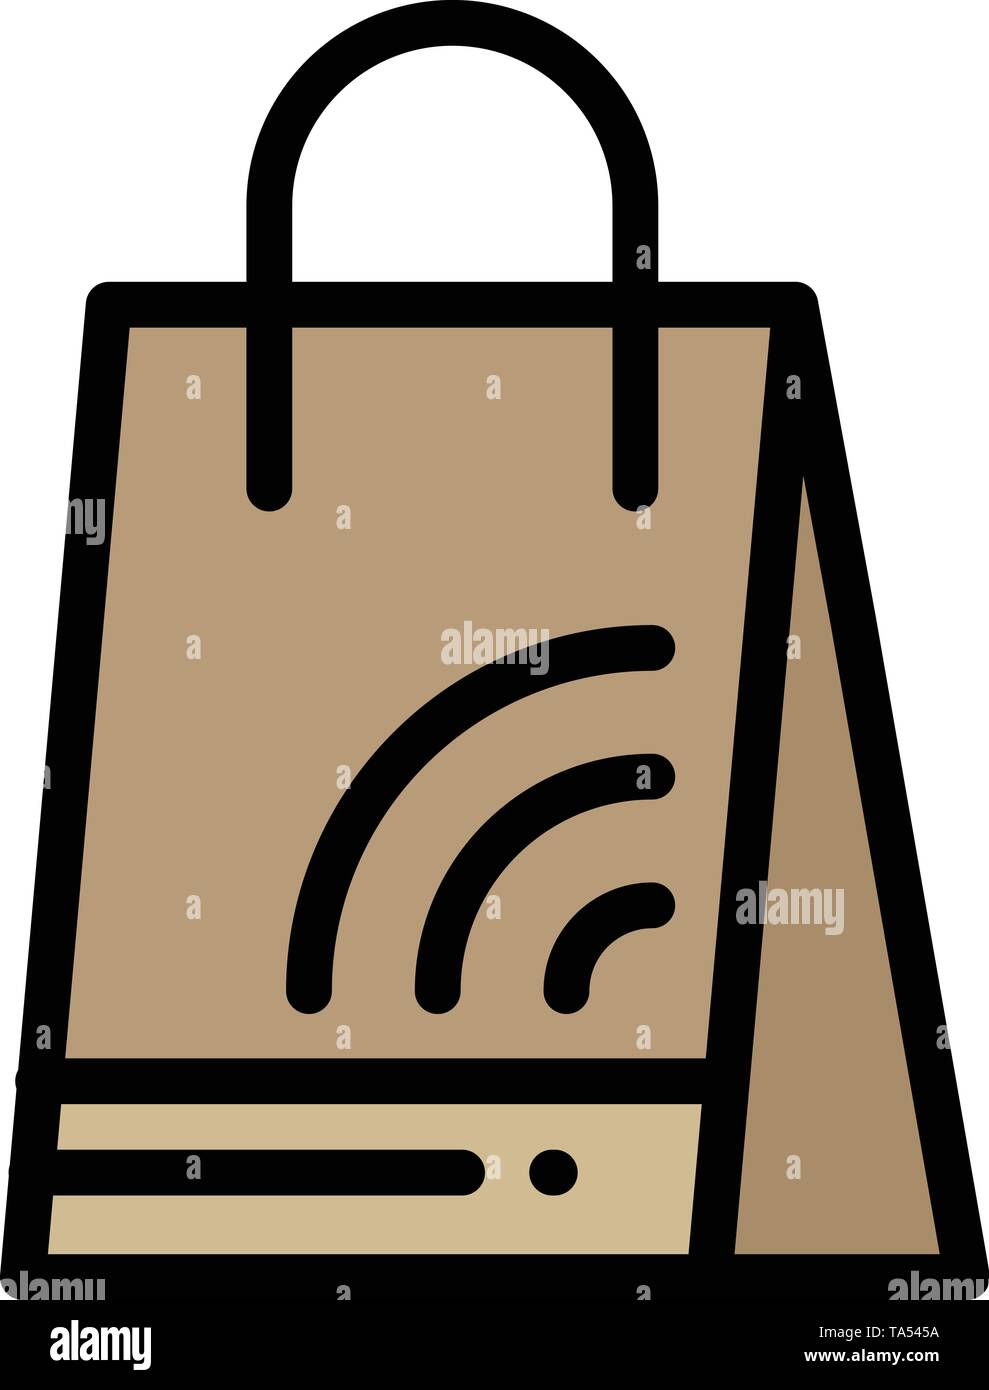 Bag, Handbag, Wifi, Shopping  Flat Color Icon. Vector icon banner Template - Stock Image